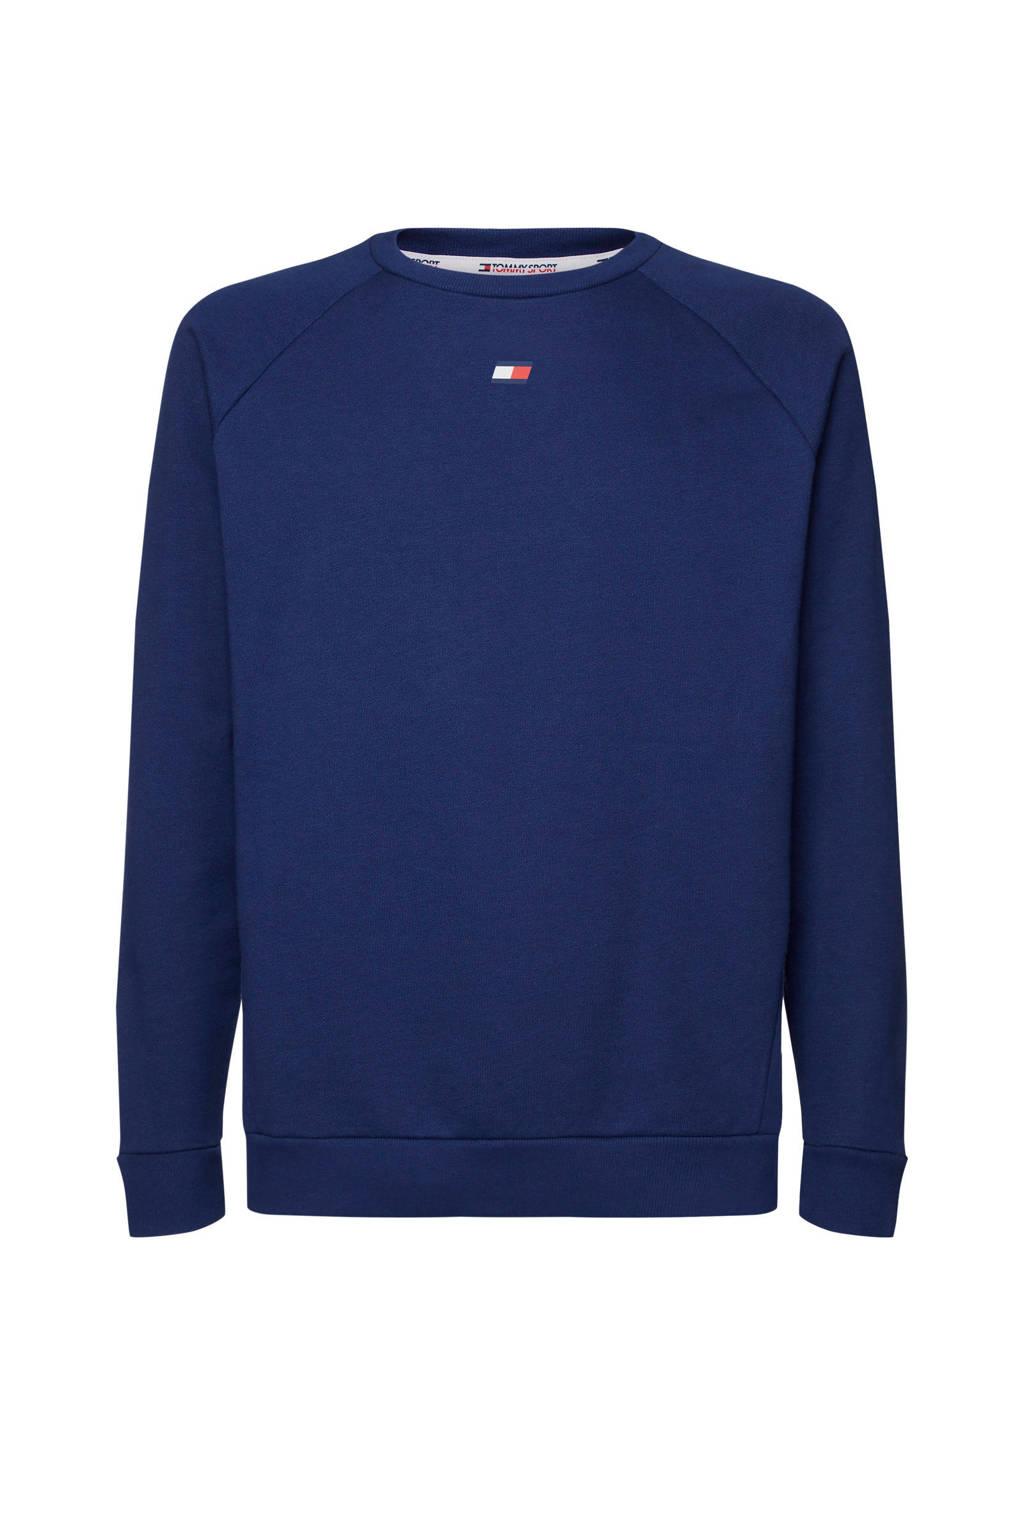 Tommy Hilfiger Sport   sweater donkerblauw, Donkerblauw